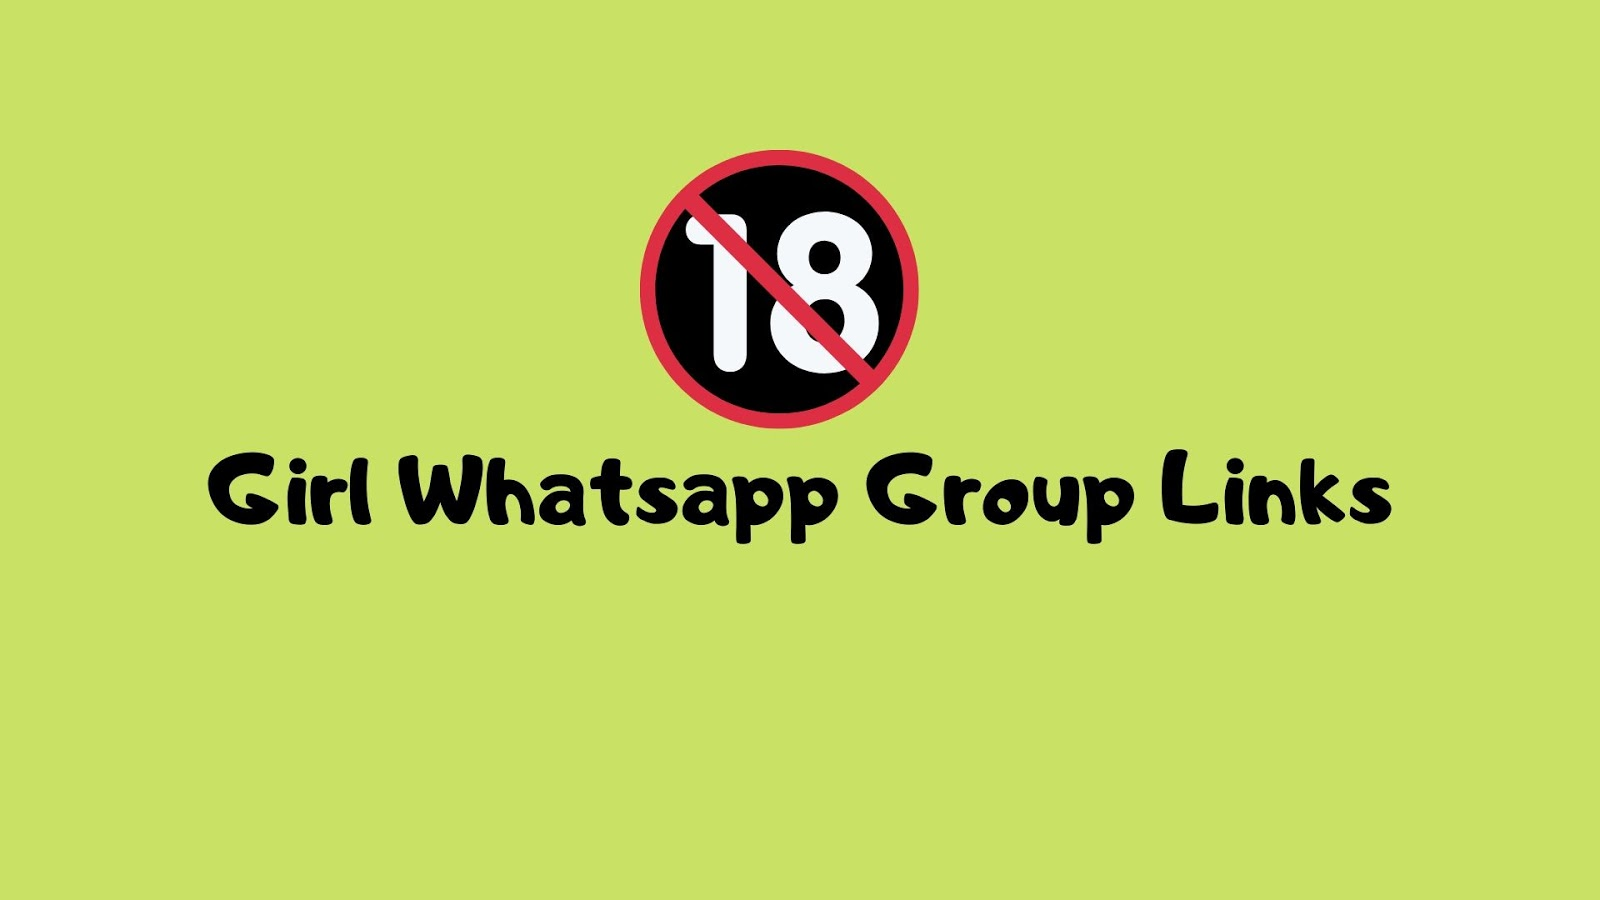 inurl:links mobile sex portal